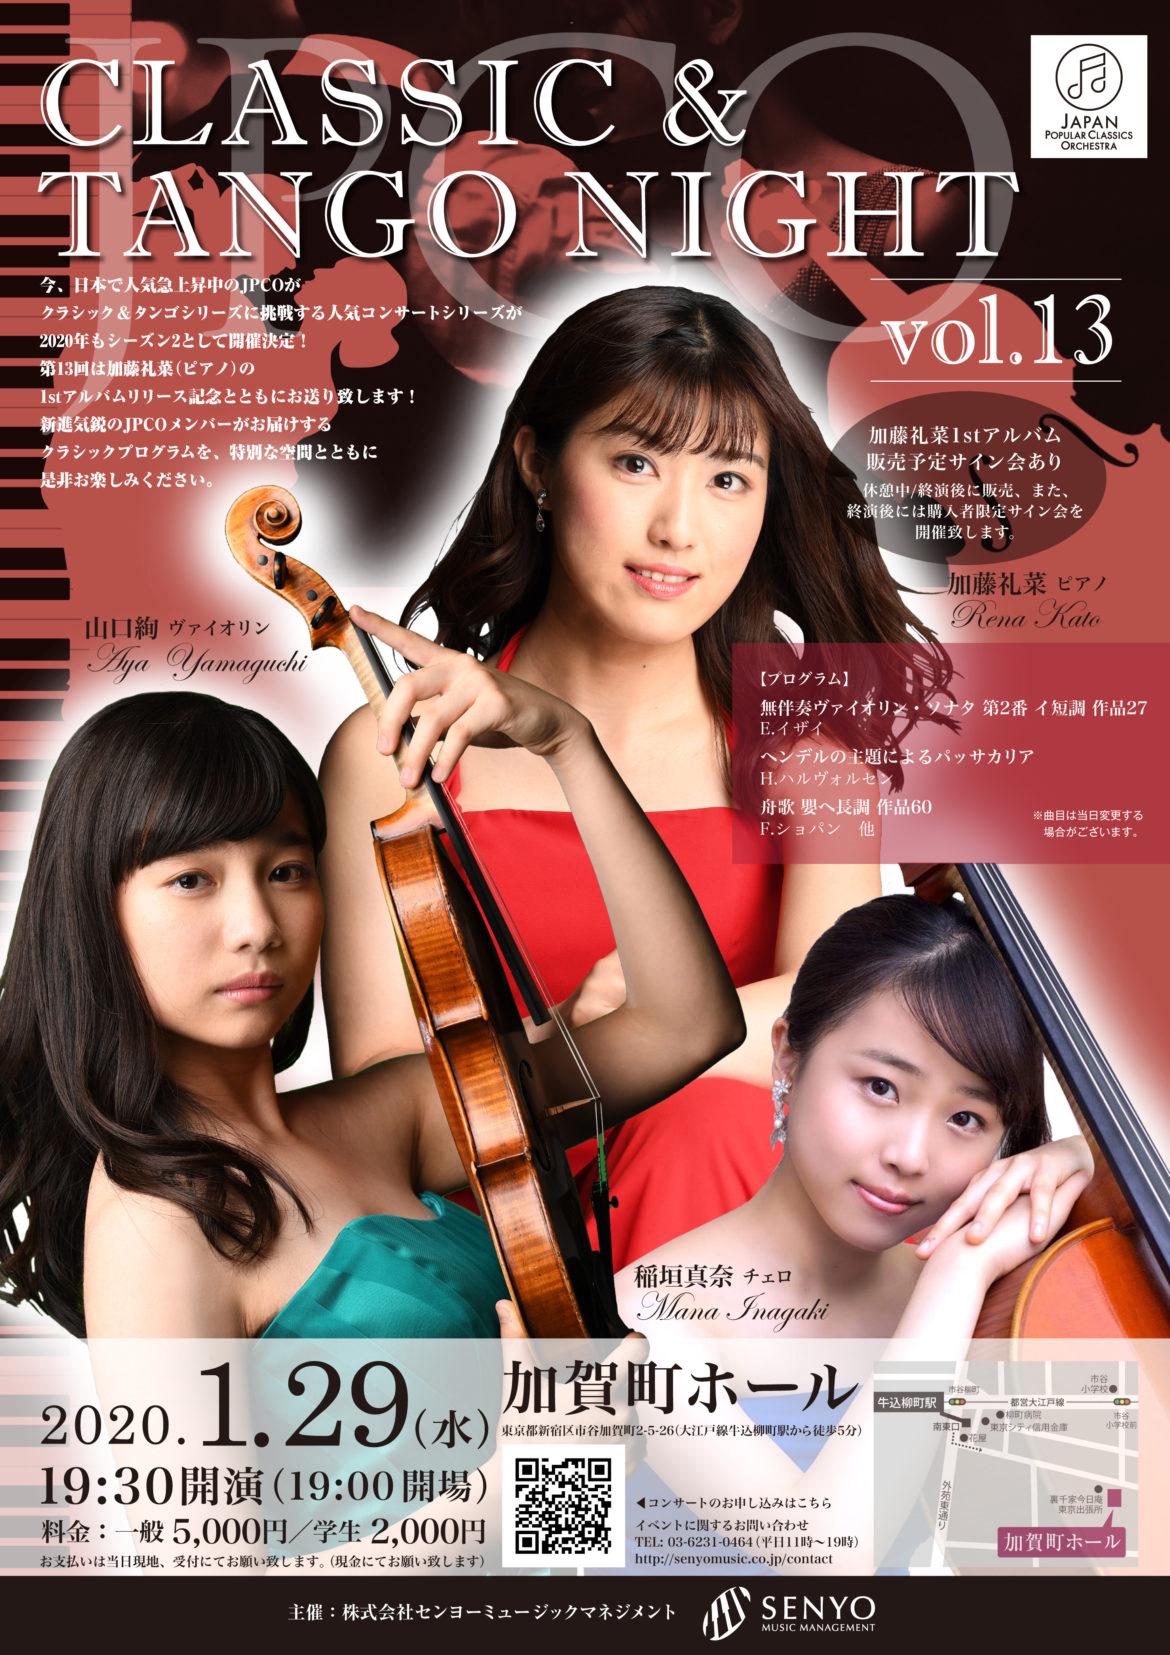 2020.1.29  JPCO CLASSIC & TANGO NIGHT  vol.13